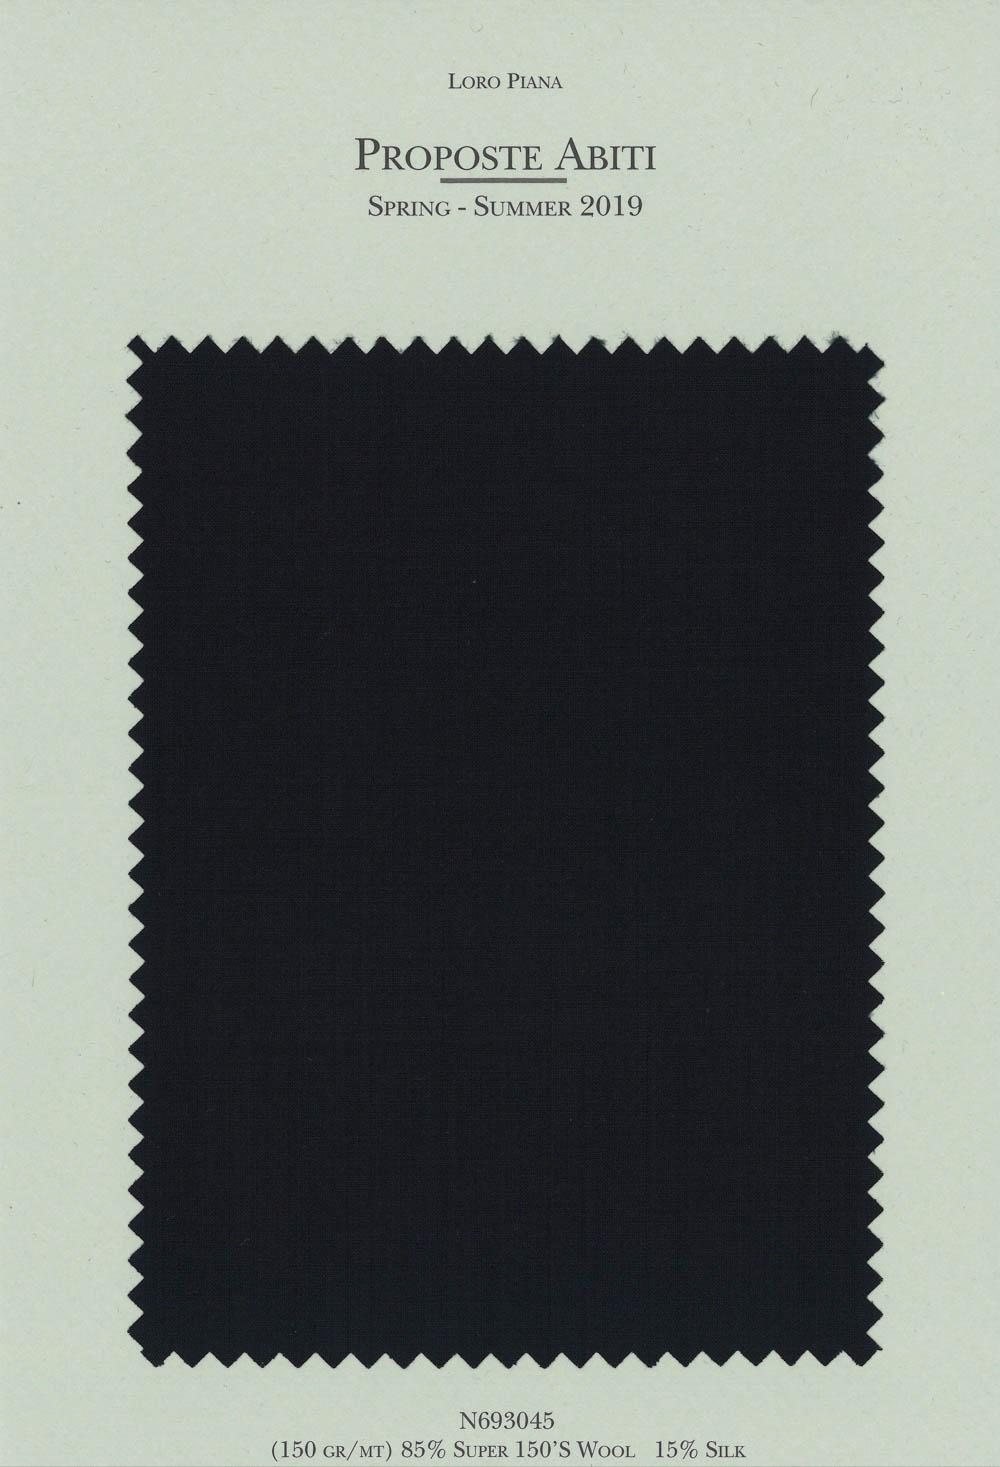 N693045